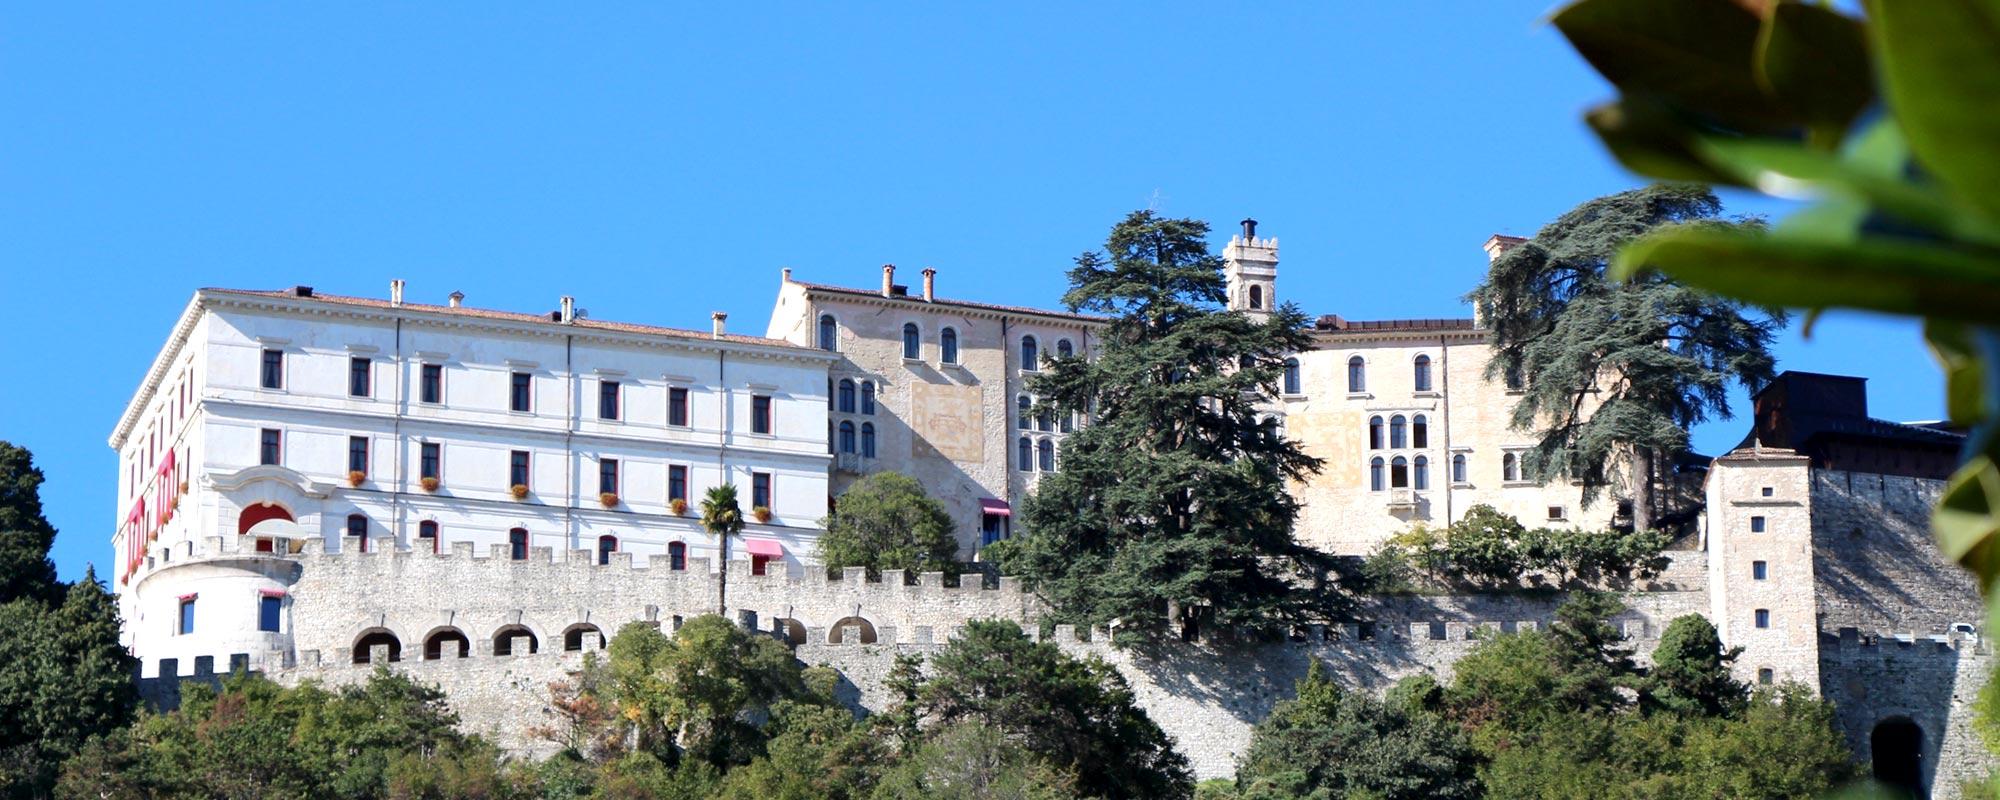 CastelBrando à Cison di Valmarino Italie